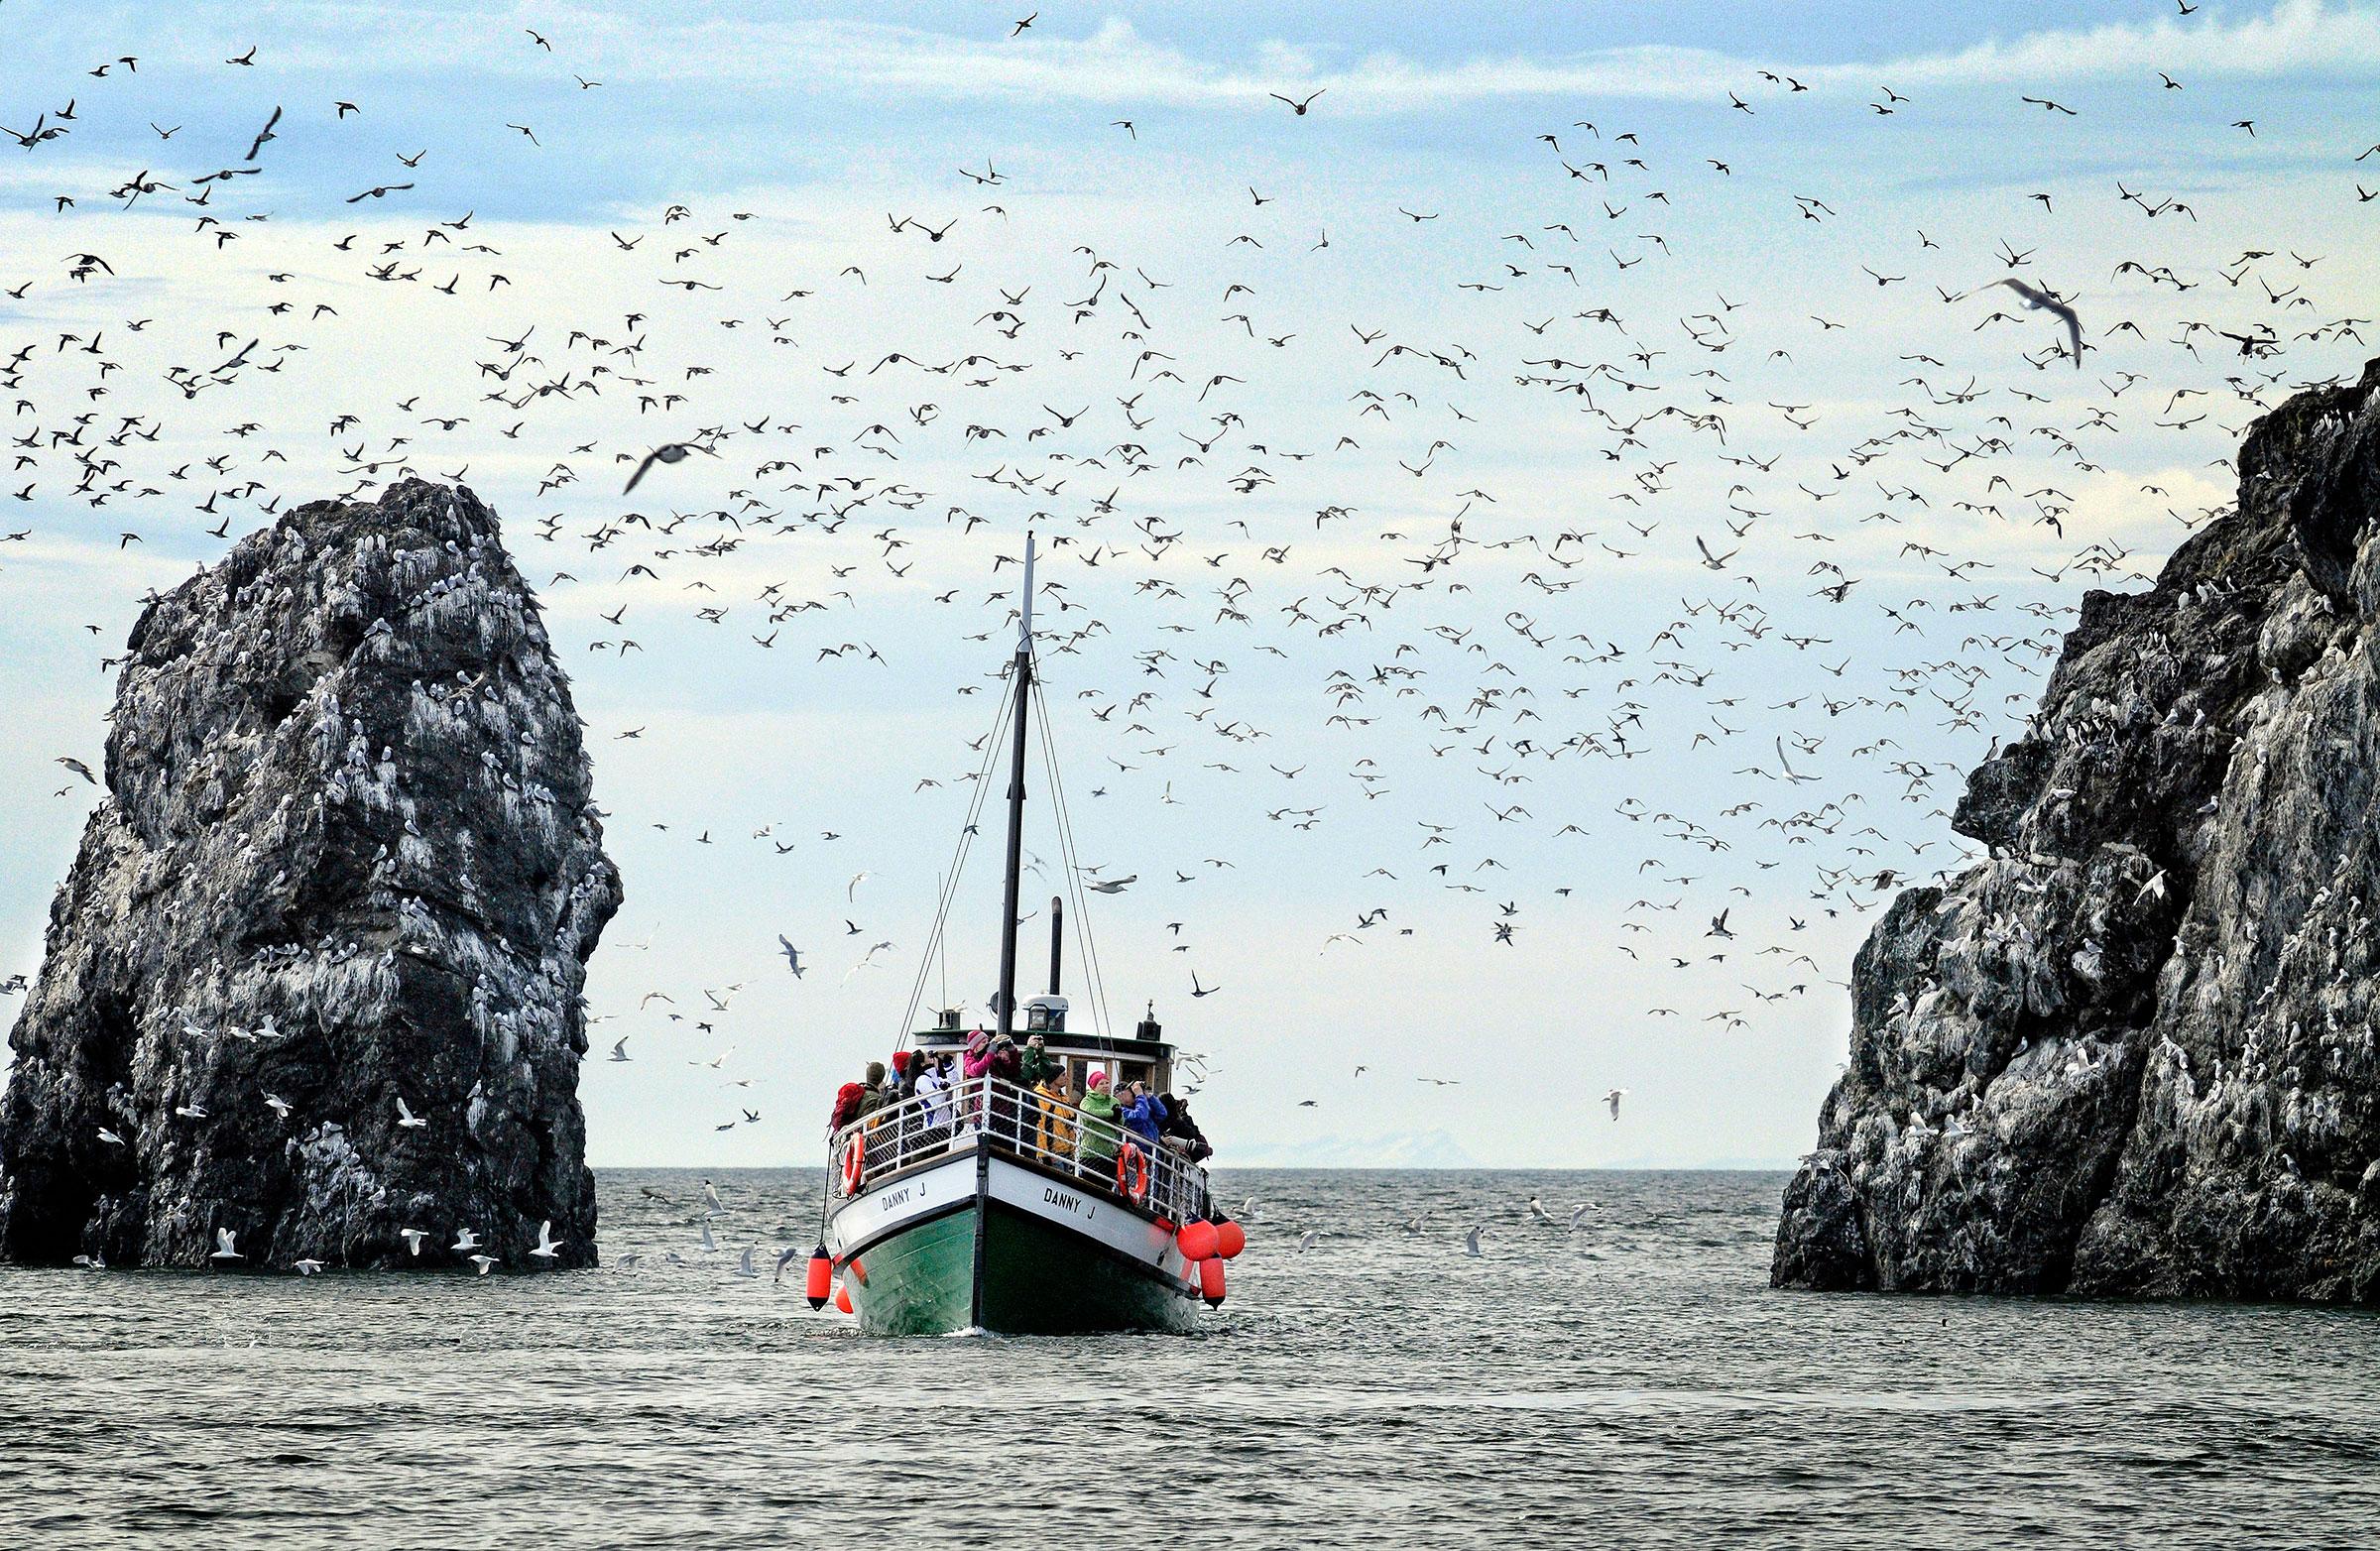 At Alaska's Kachemak Bay Shorebird Festival, experience the hustle and bustle of seabird colonies up close. Jim Lavrakas/Far North Photography